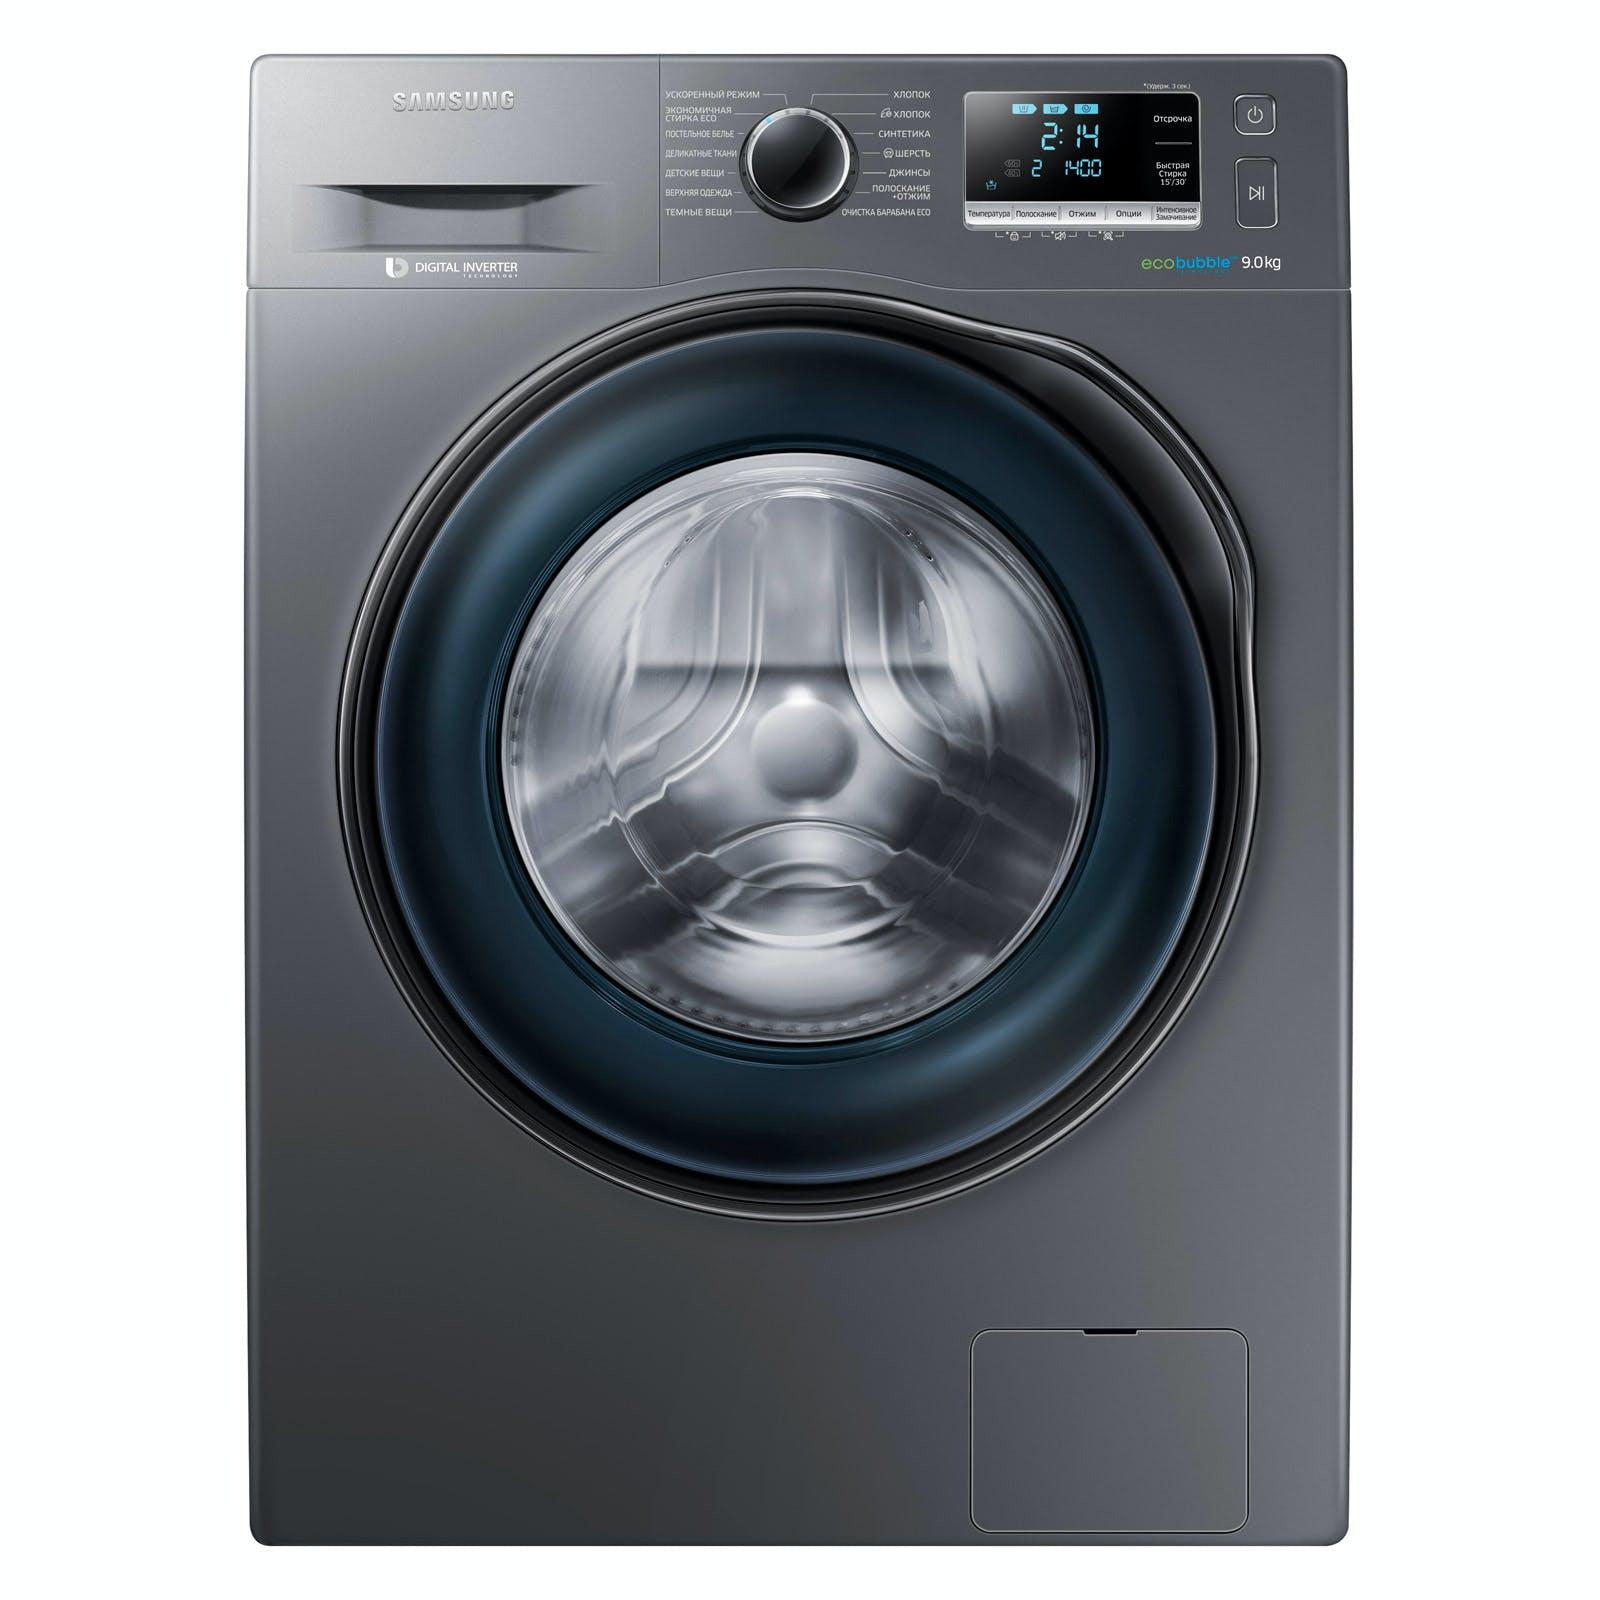 samsung ww90j6410cx eco bubble washing machine in inox. Black Bedroom Furniture Sets. Home Design Ideas